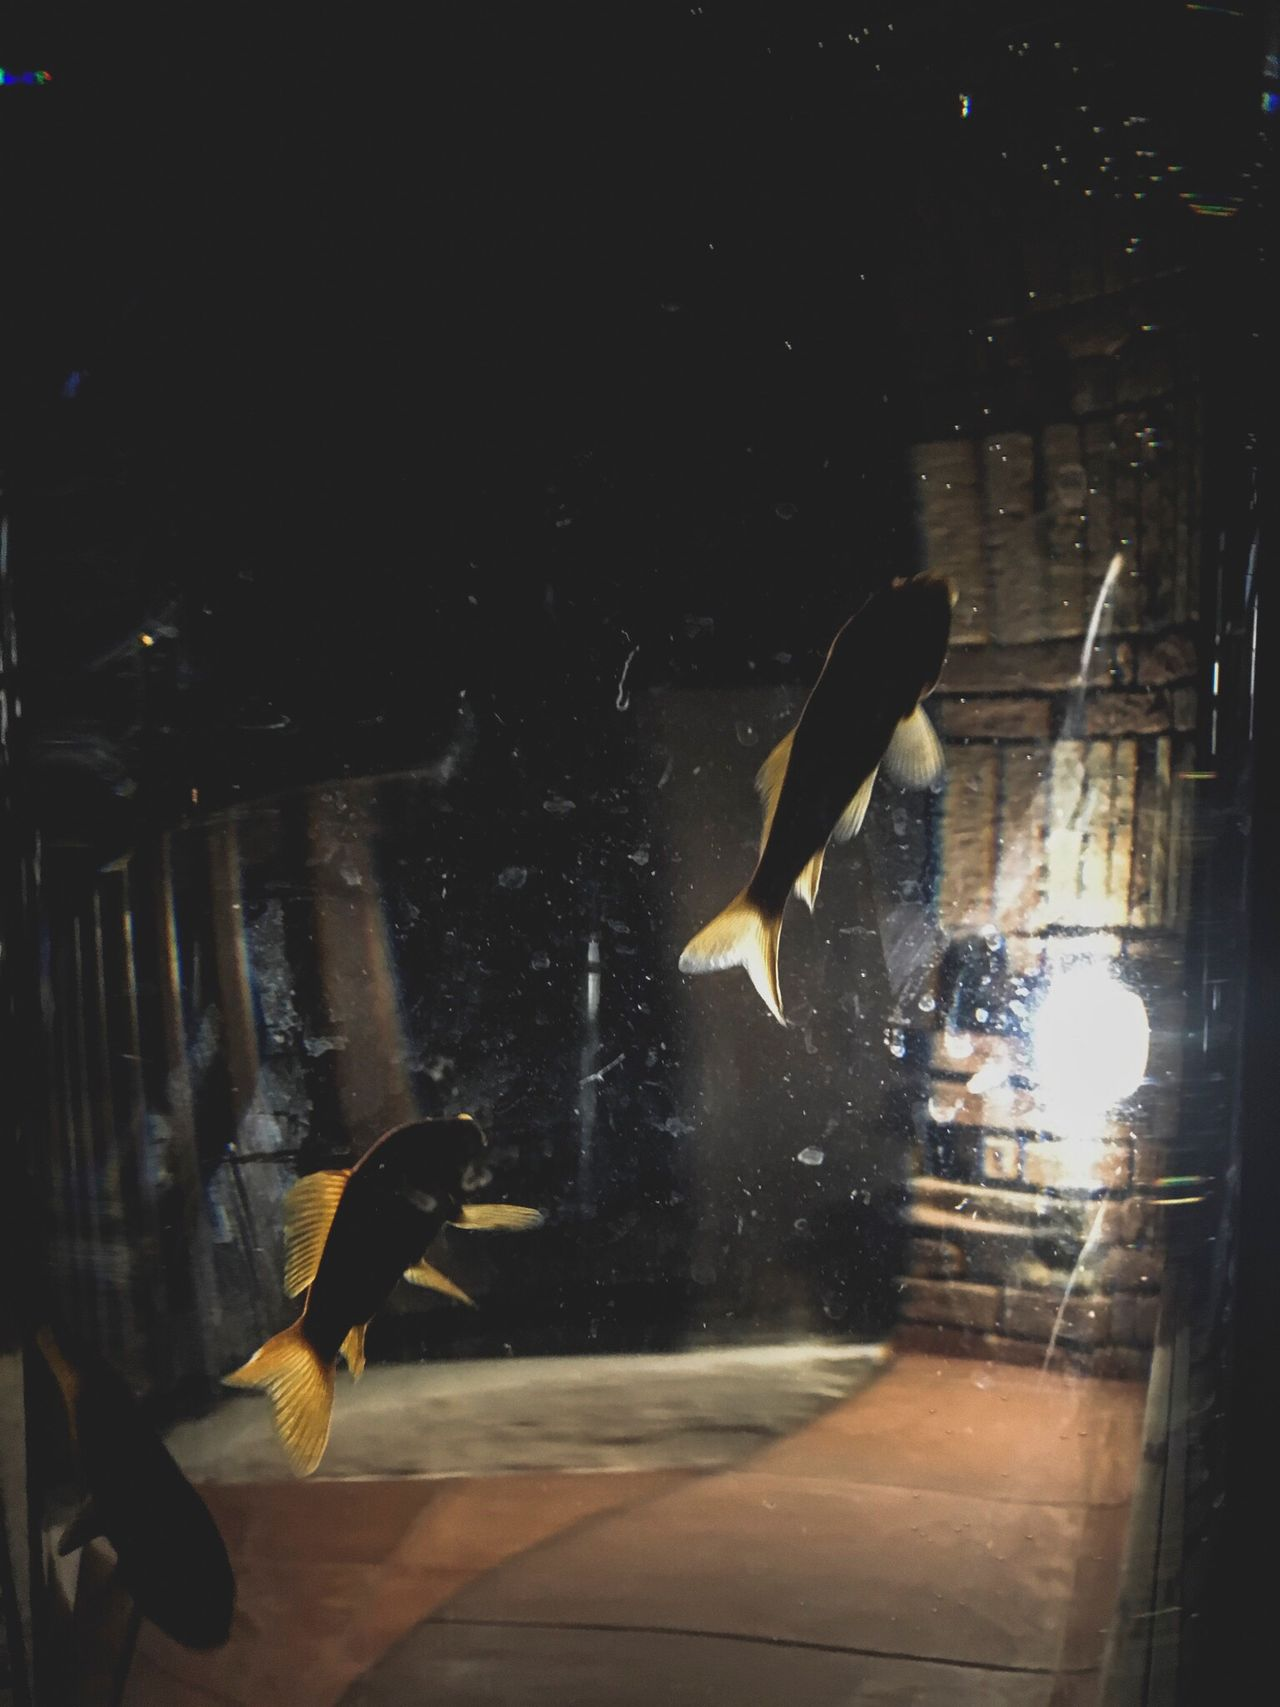 Fish Fishbowl Feel Free or Not Flying in the Water Orangefish David De La Cruz David De La Cruz Indoors  Nature Night